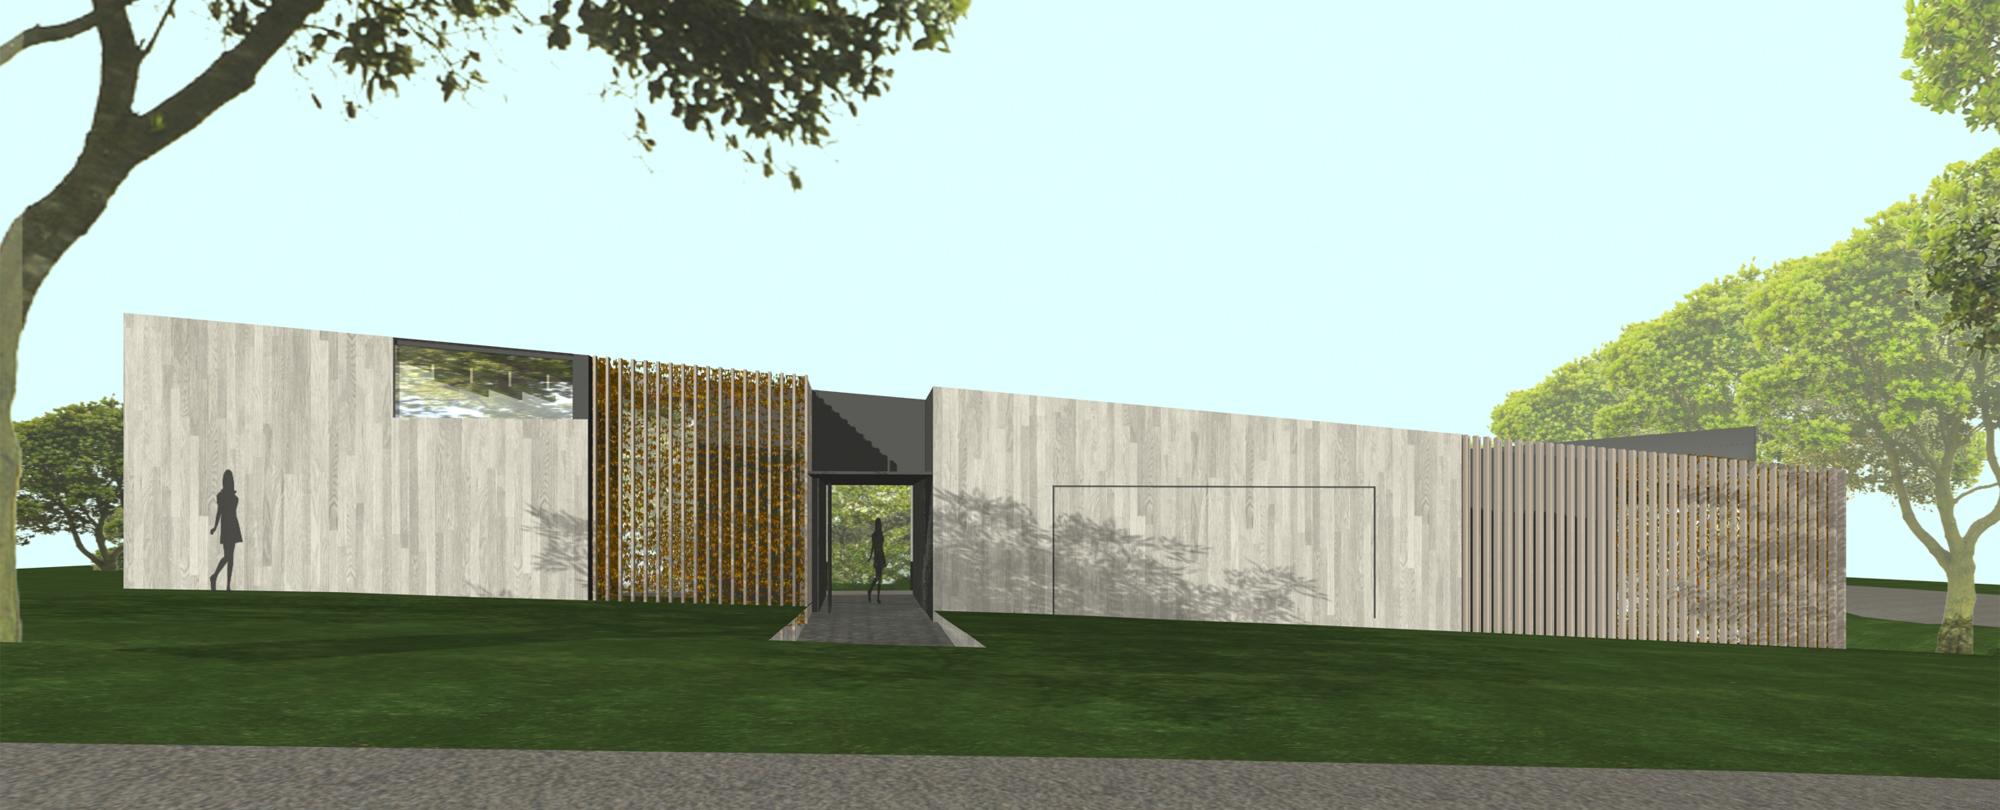 Flinders-Bower-Architecture